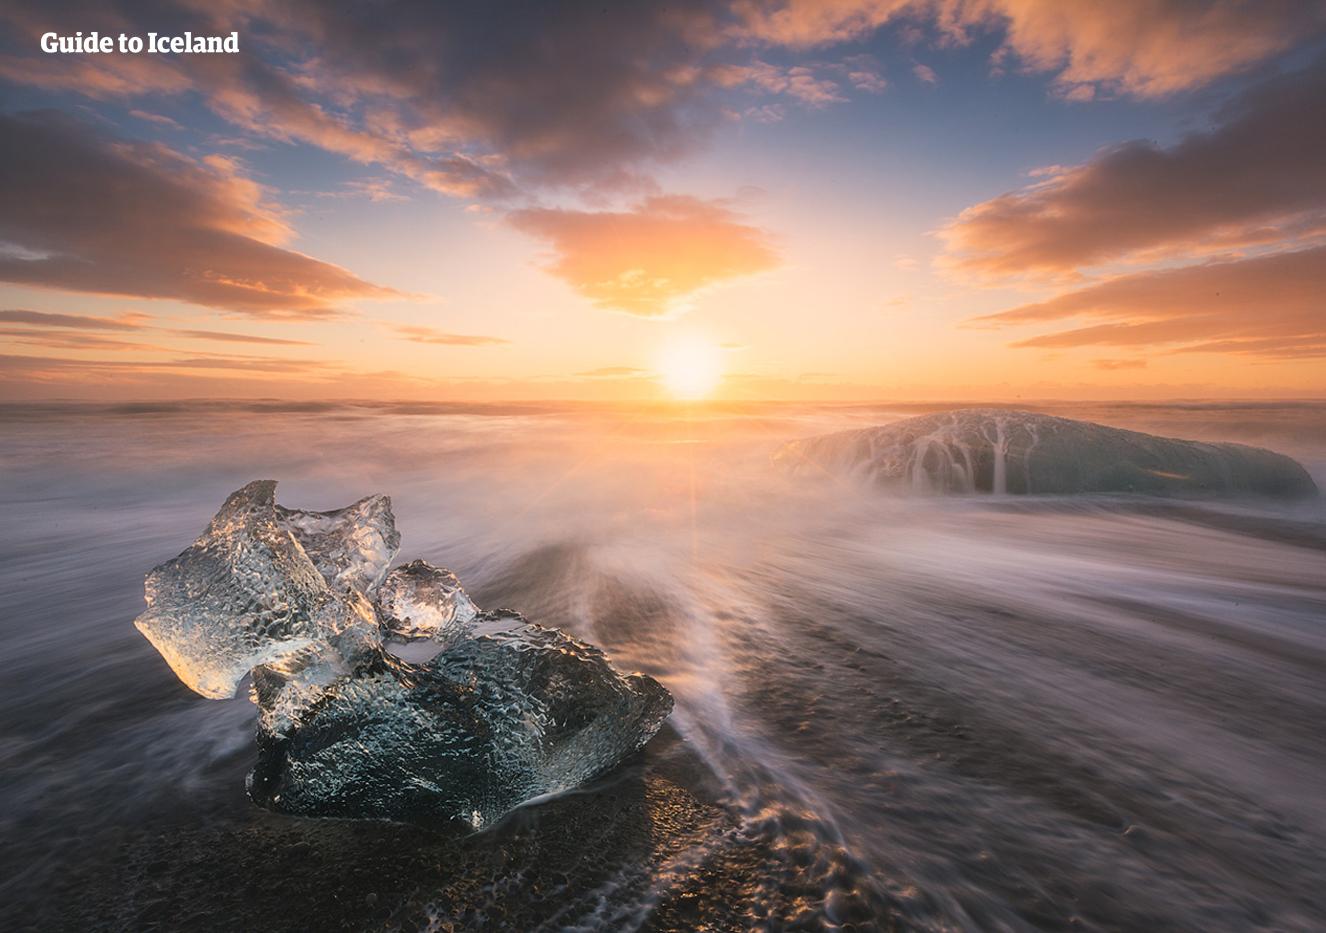 Ice melting as the sun sets on the Diamond Beach in Vatnajökull National Park.